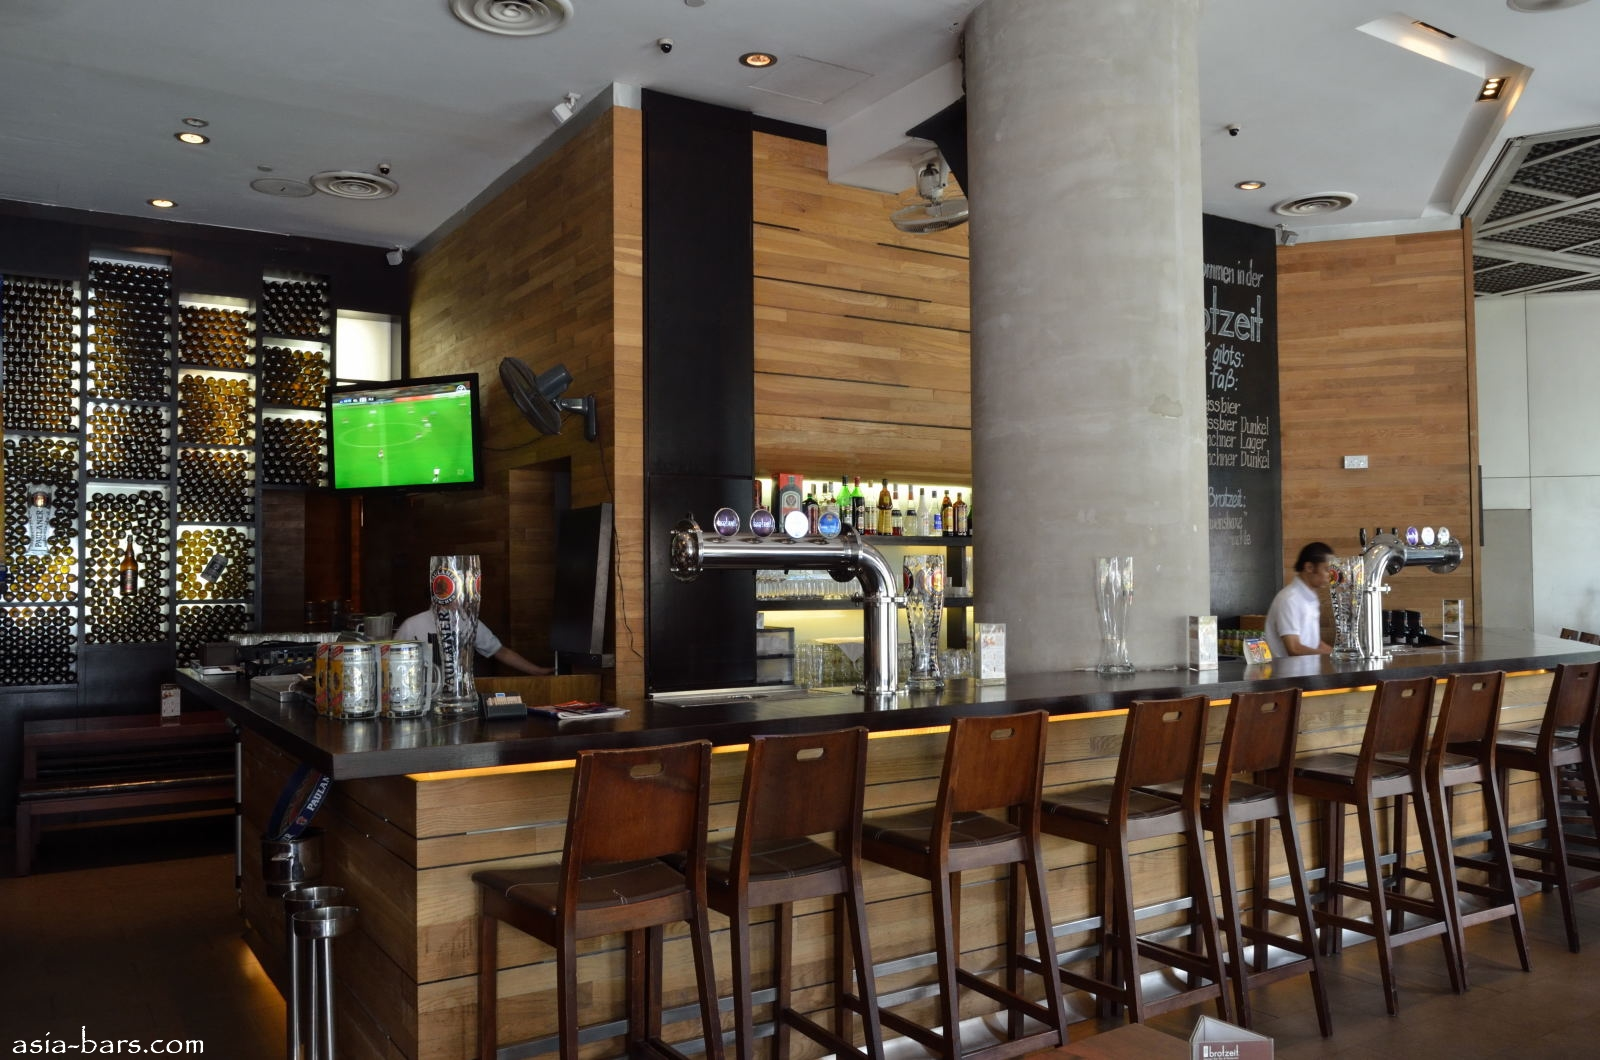 Brotzeit German Bier Bar Amp Restaurant At Raffles City In